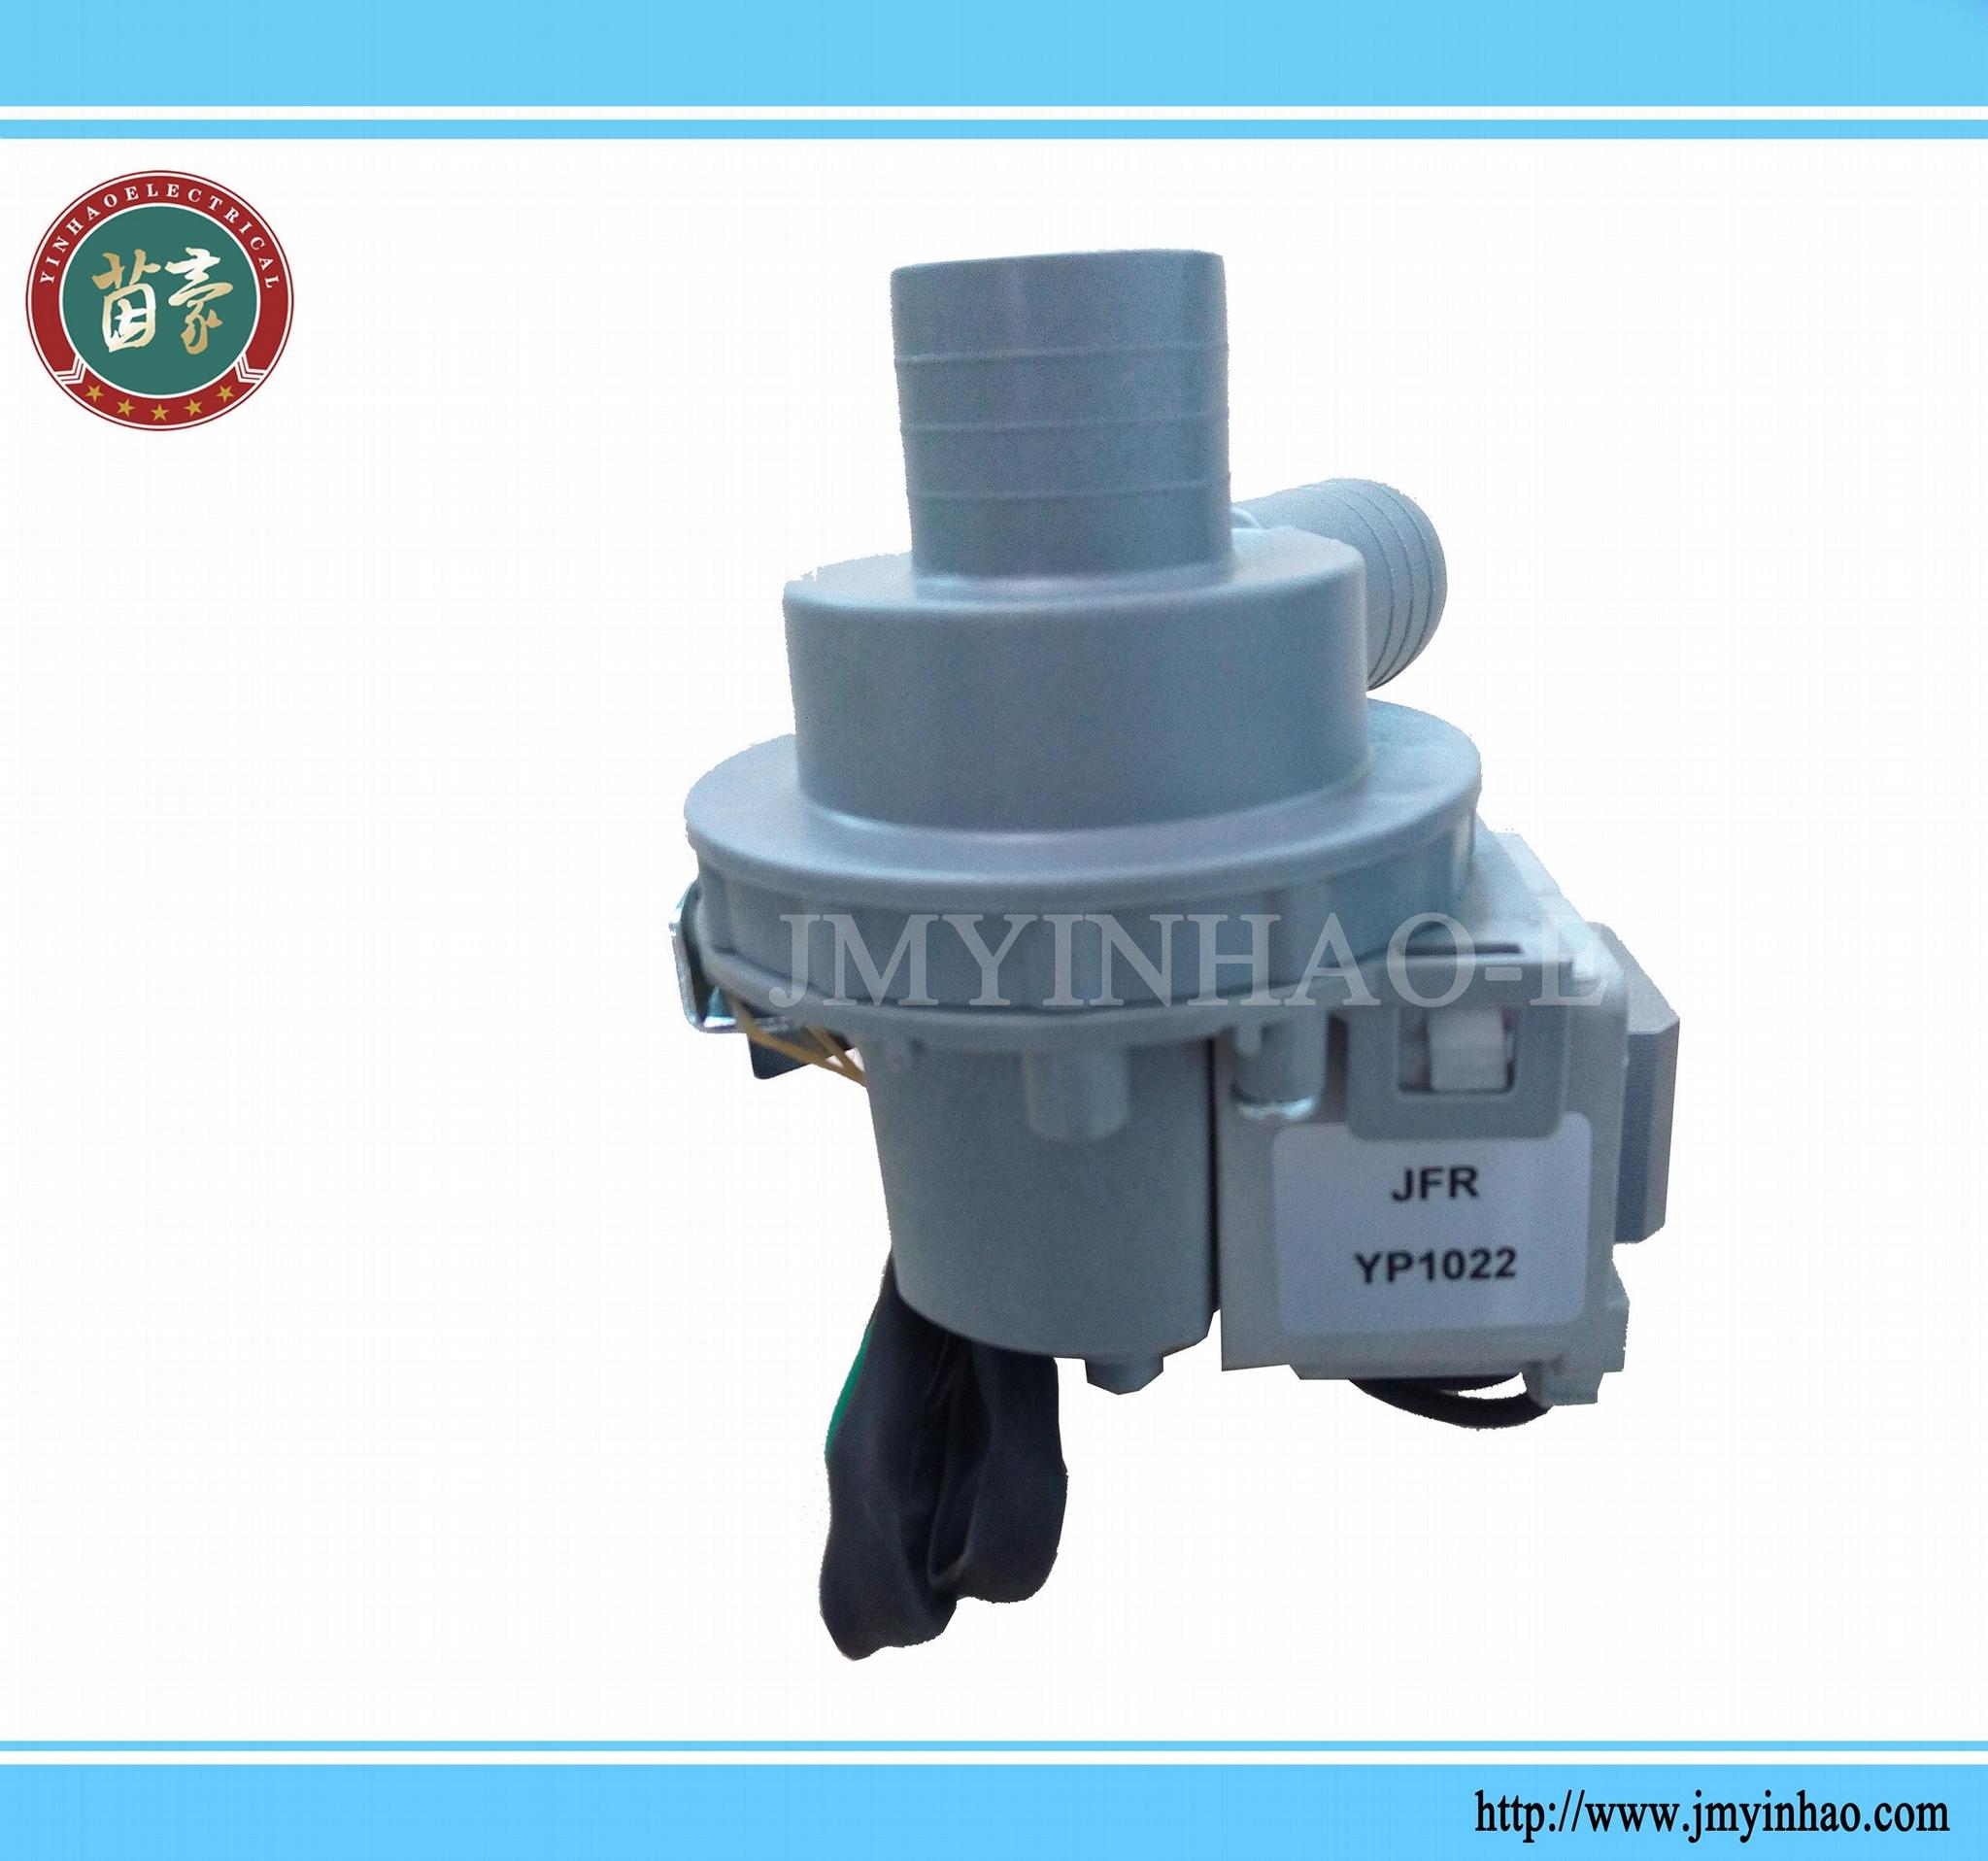 220V Magnetic Pump / Drain Pump for Washing Machine 3